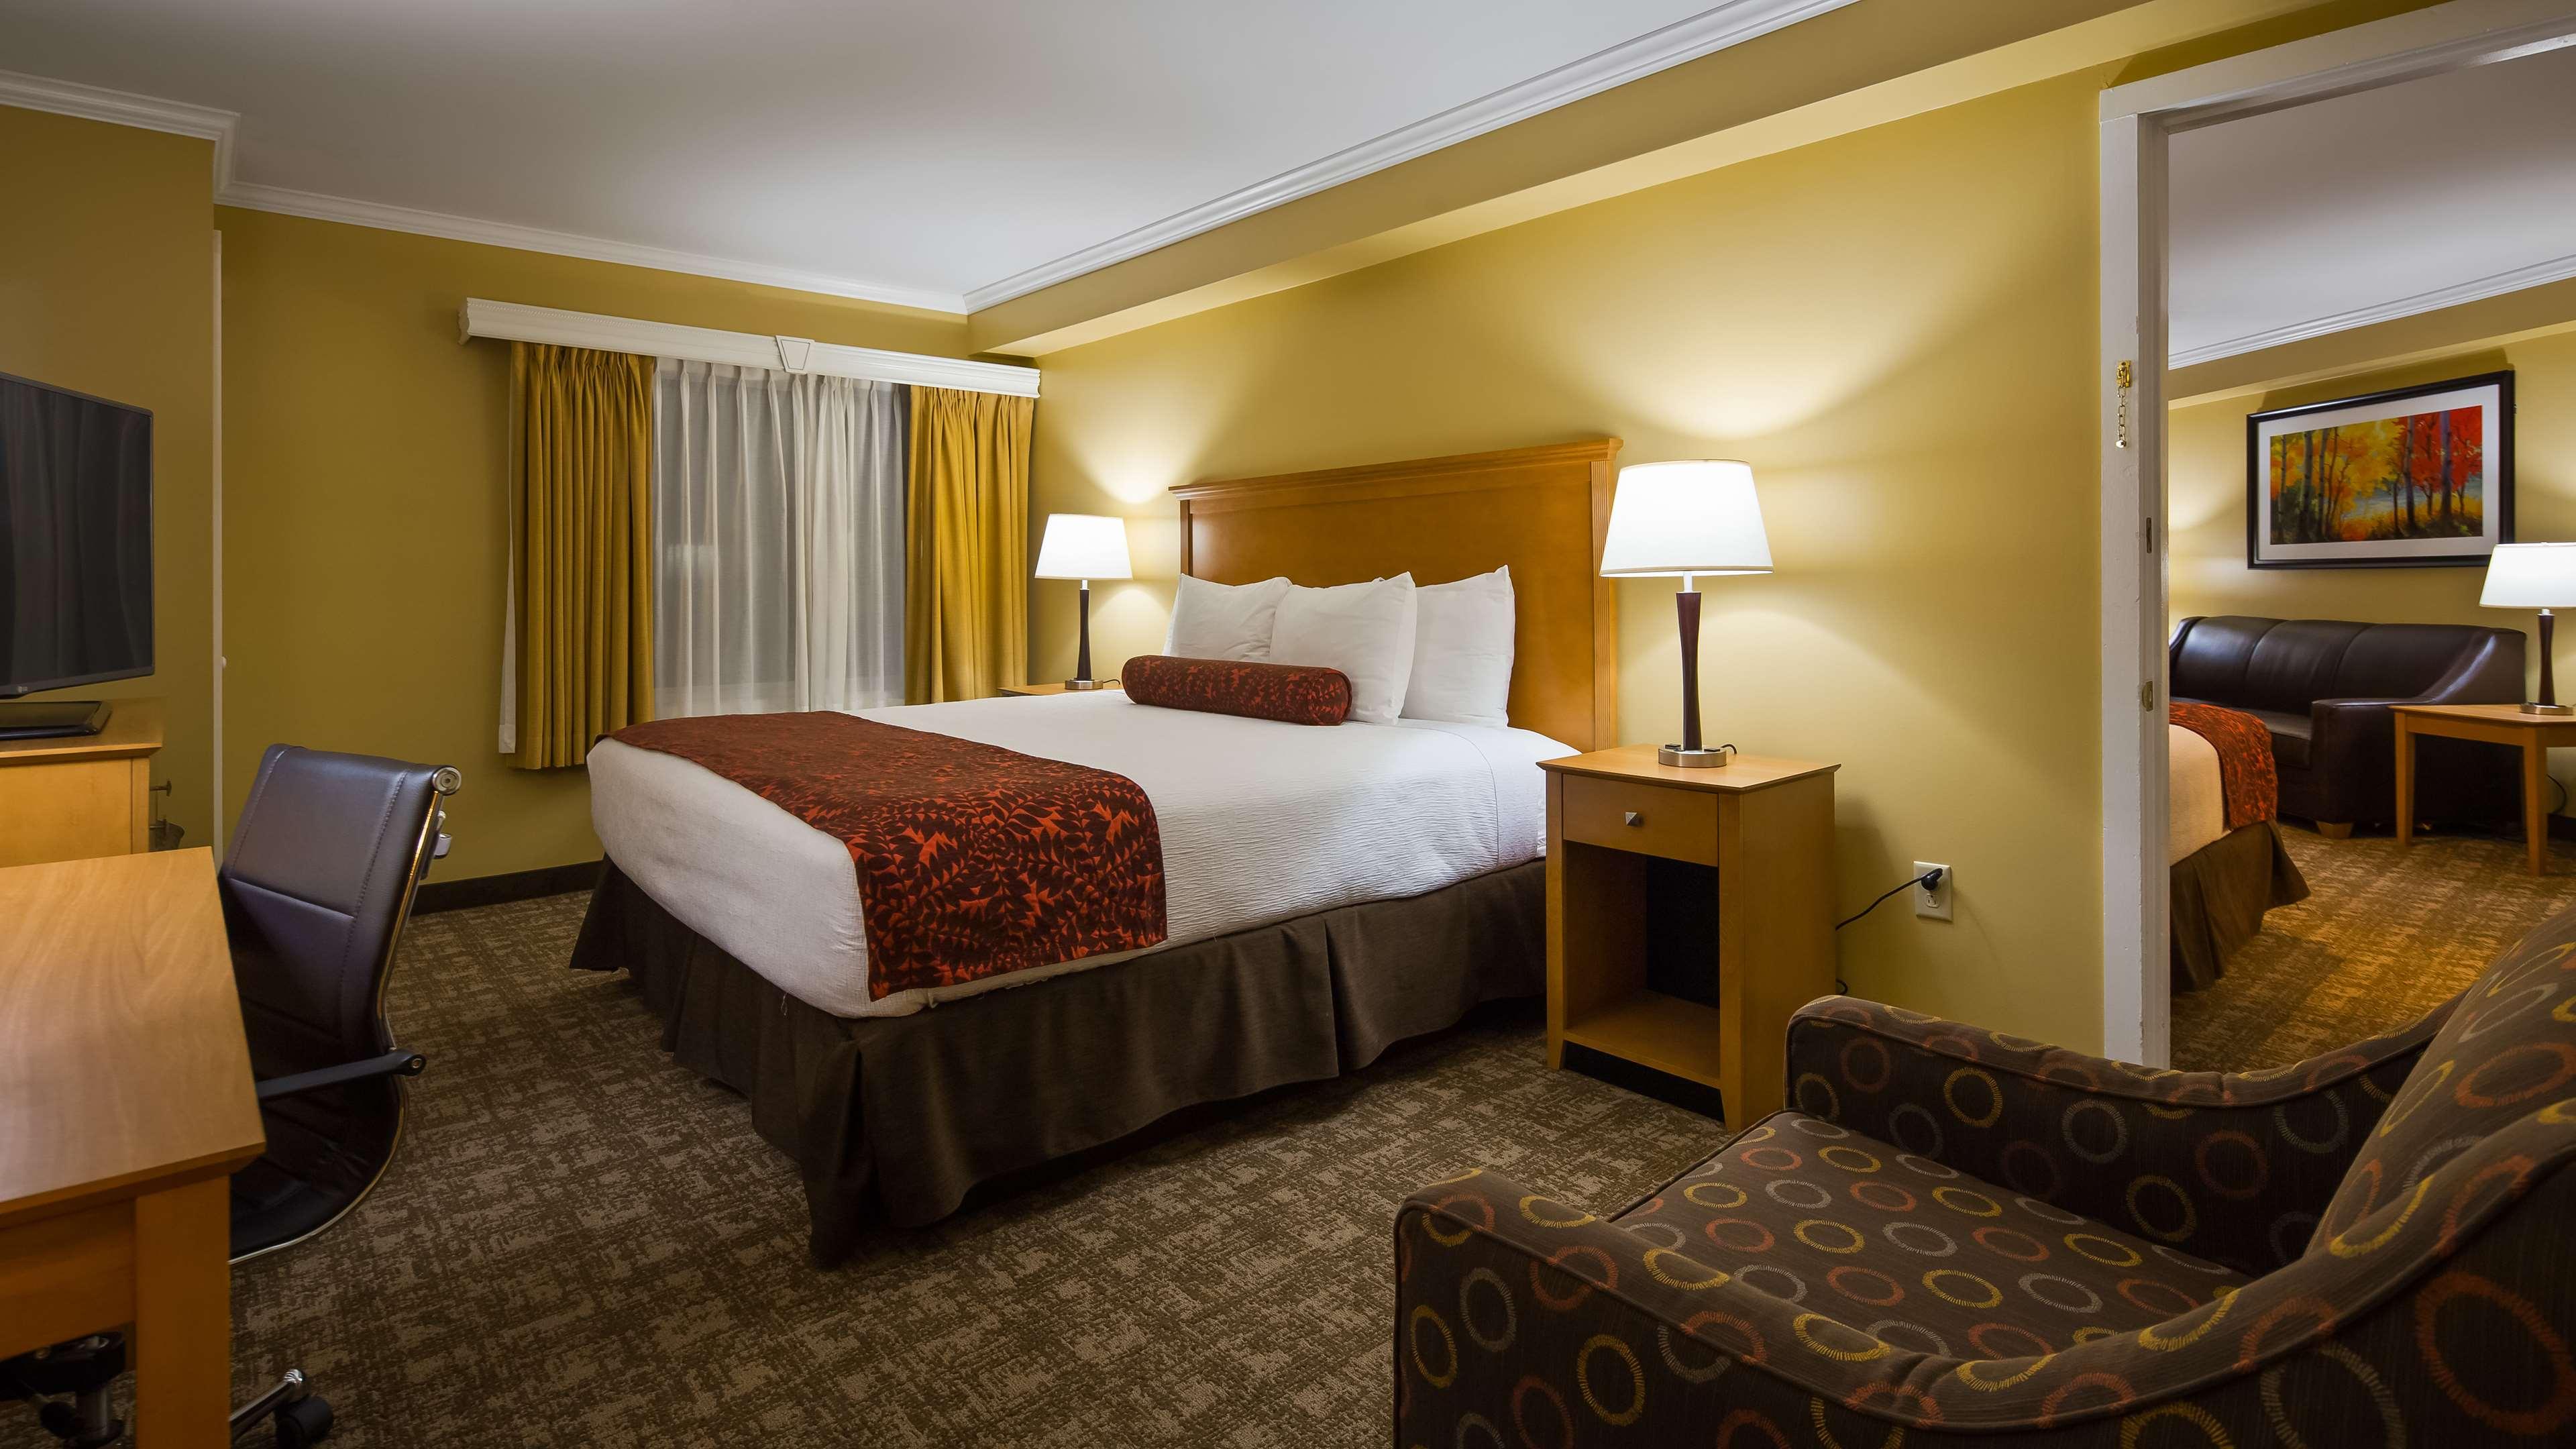 Best Western Plus Windjammer Inn & Conference Center image 18